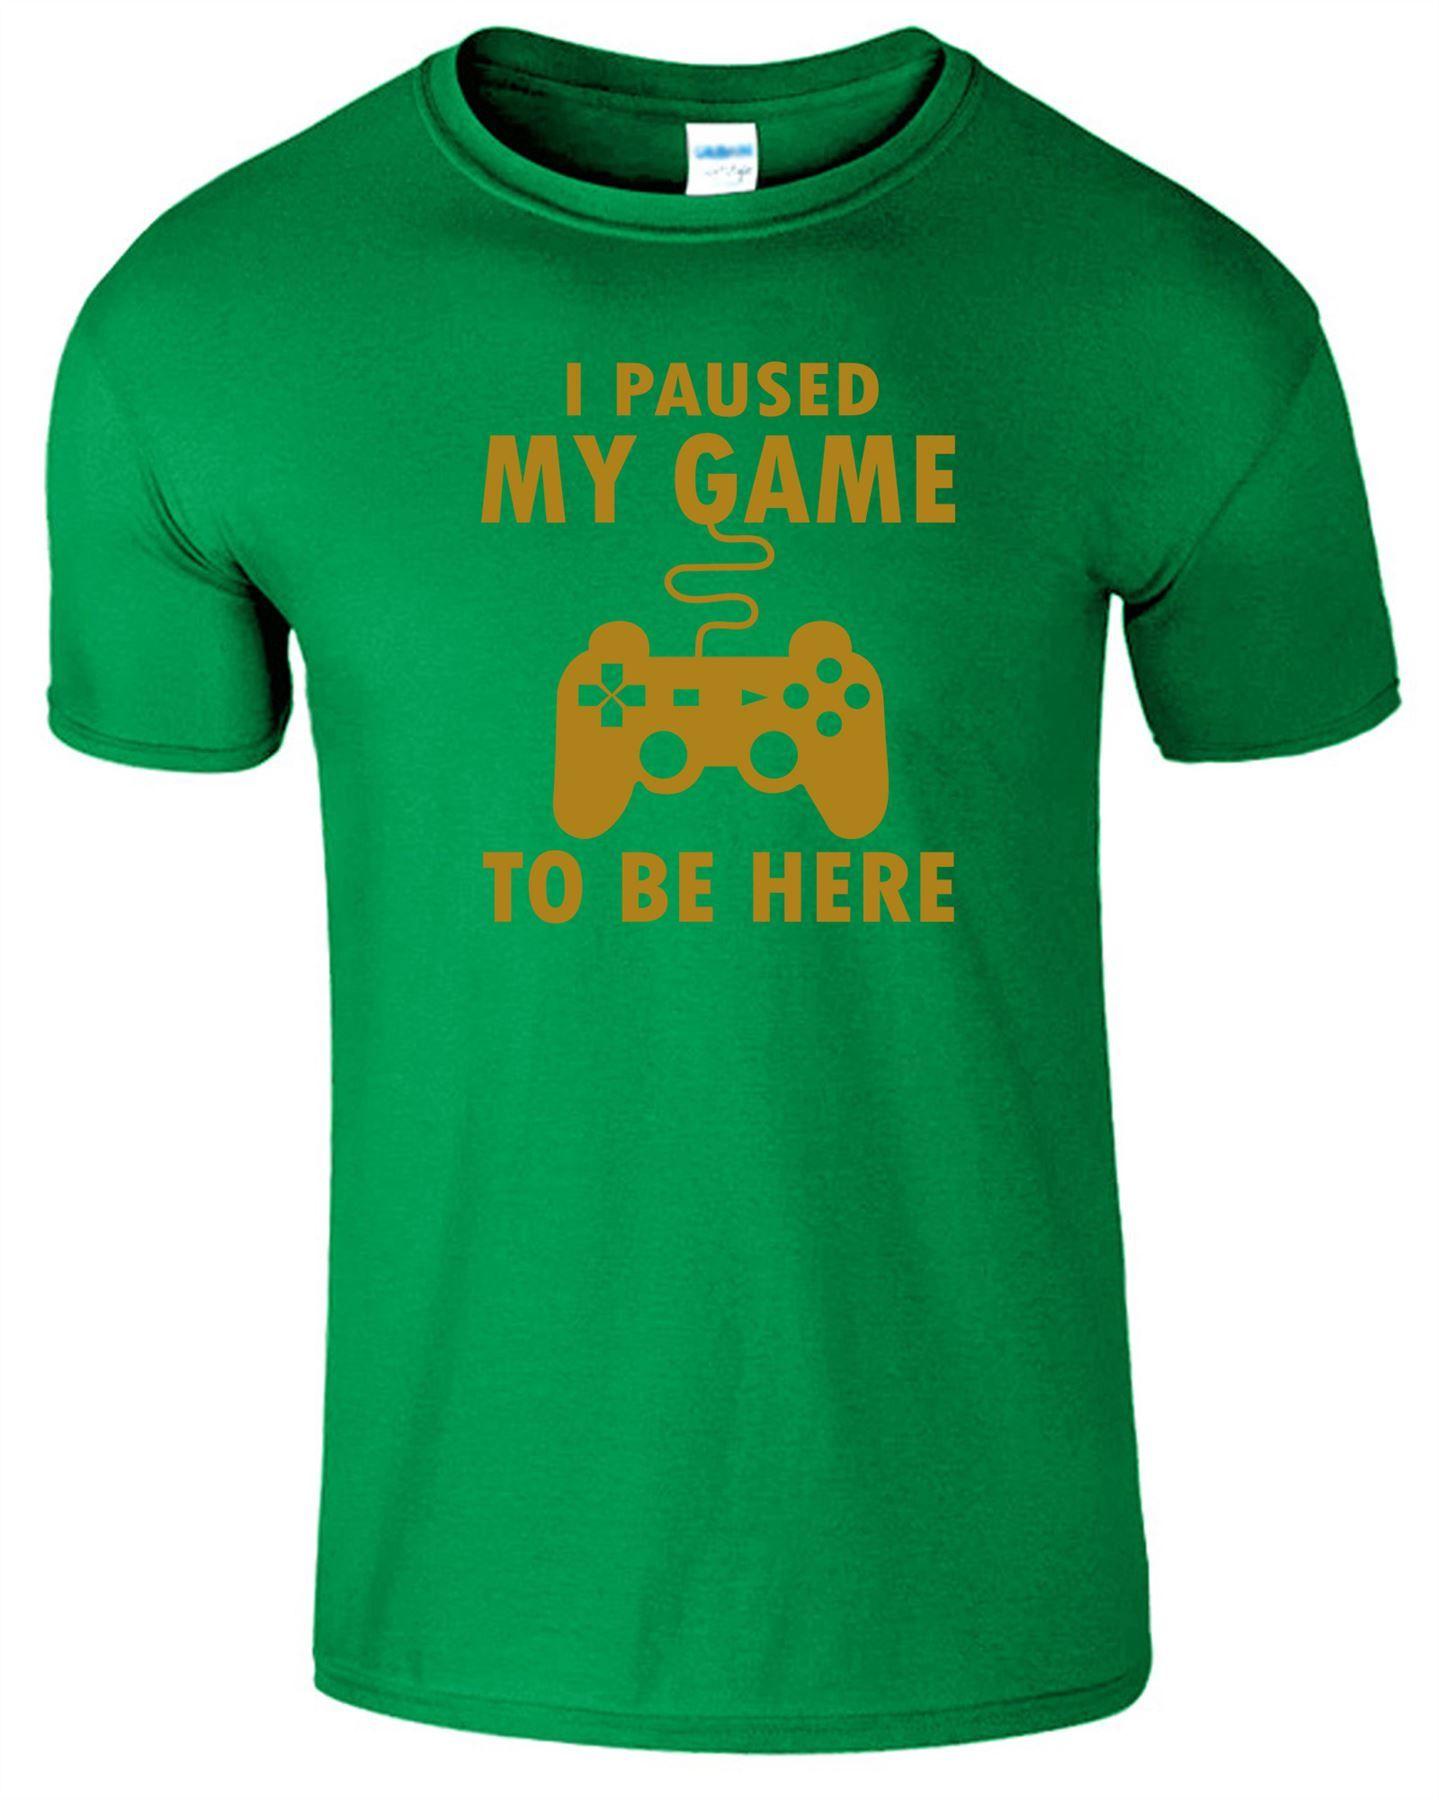 40d0a89a I PAUSED MY GAME TO BE HERE Mens T Shirt Christmas Gamer Gaming Gift Tee  Tshirt#Shirt#Christmas#Mens